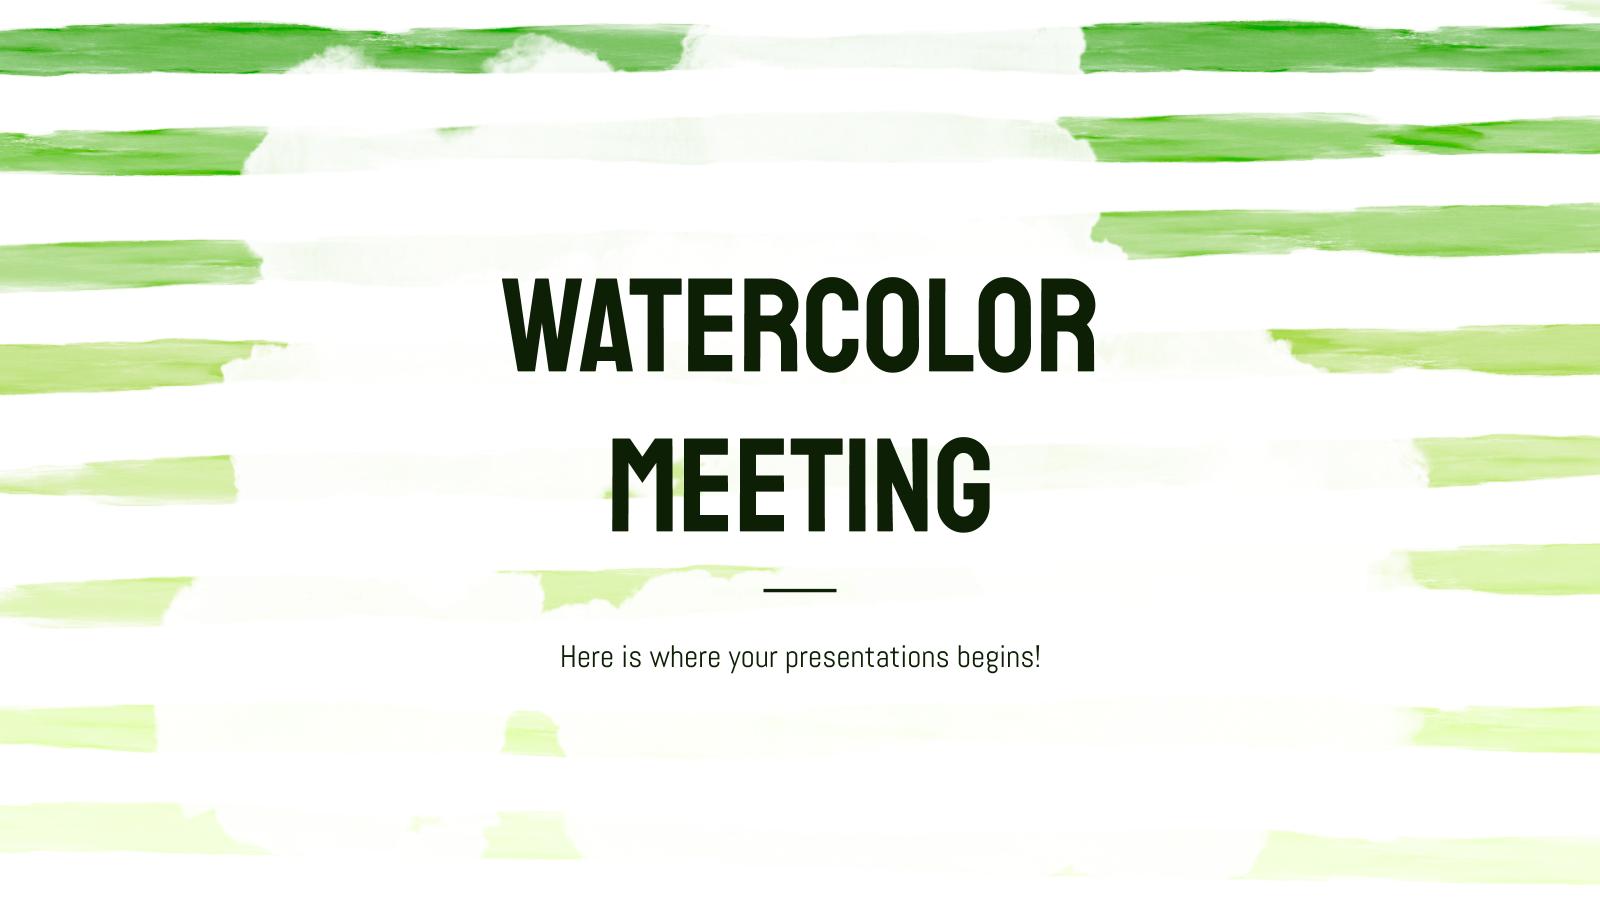 Watercolor Meeting presentation template